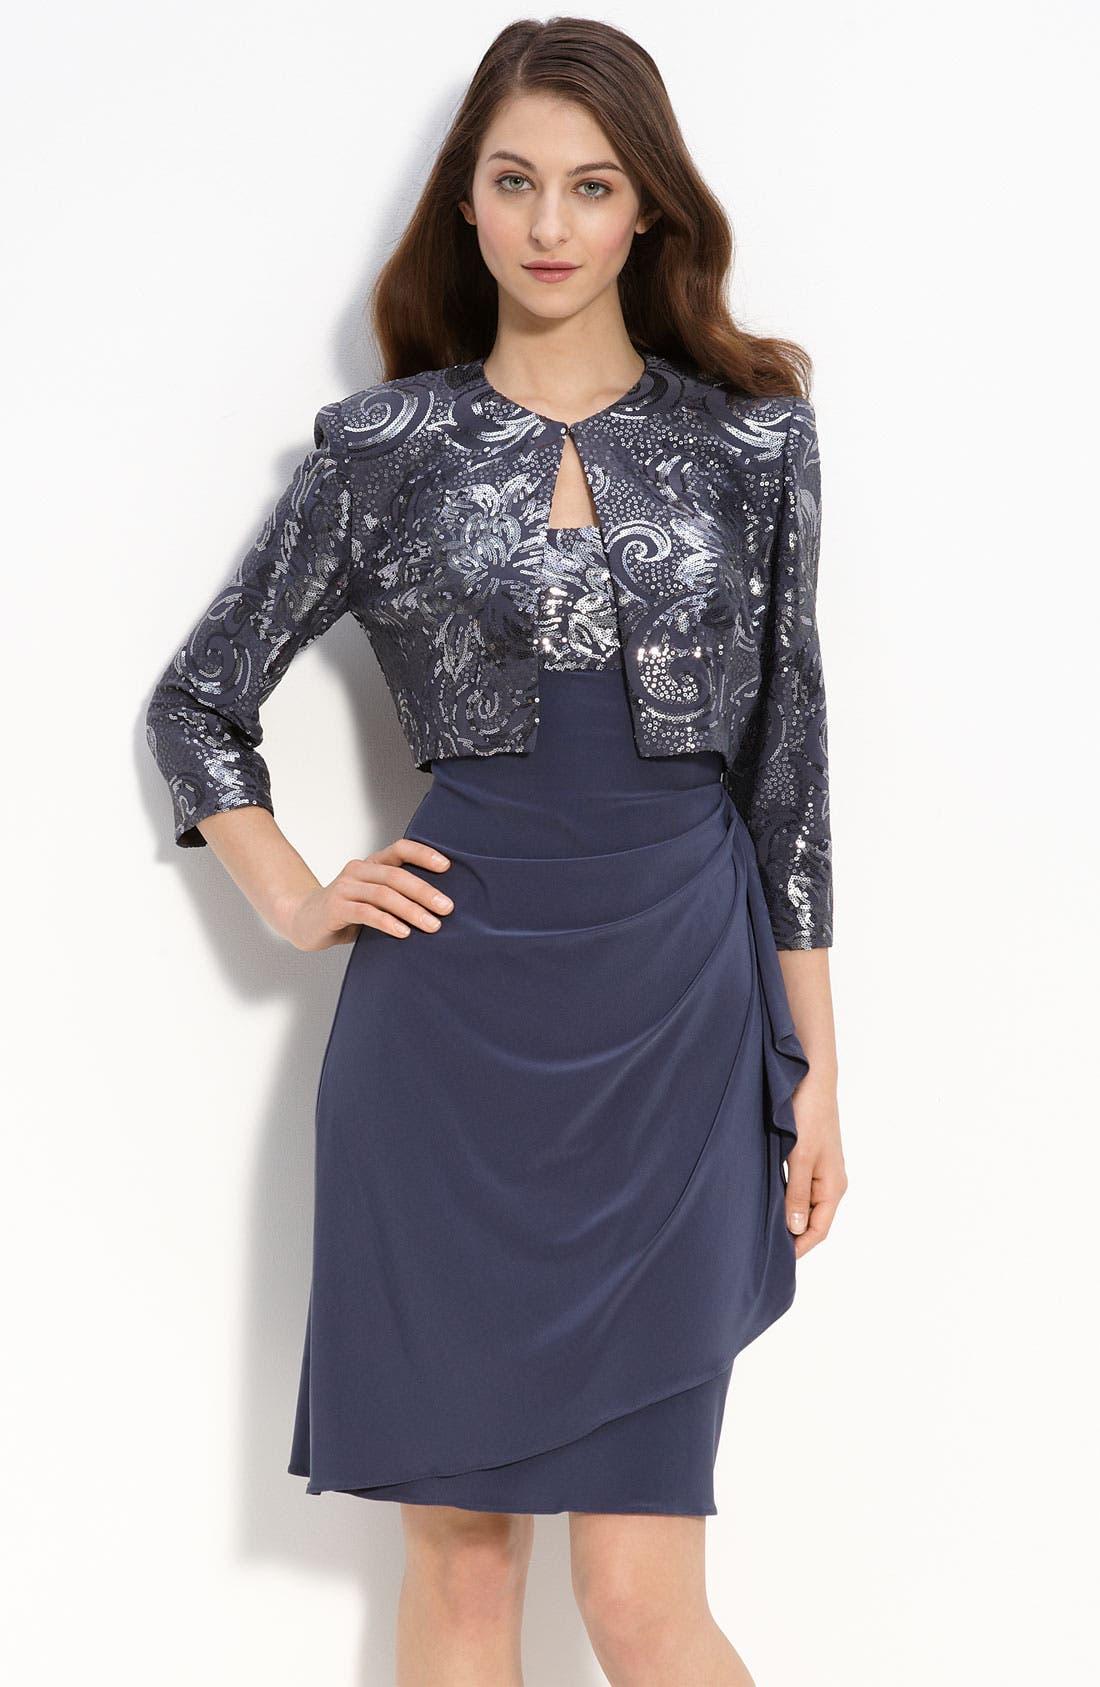 Main Image - Alex Evenings Sequin Jersey Sheath Dress & Bolero